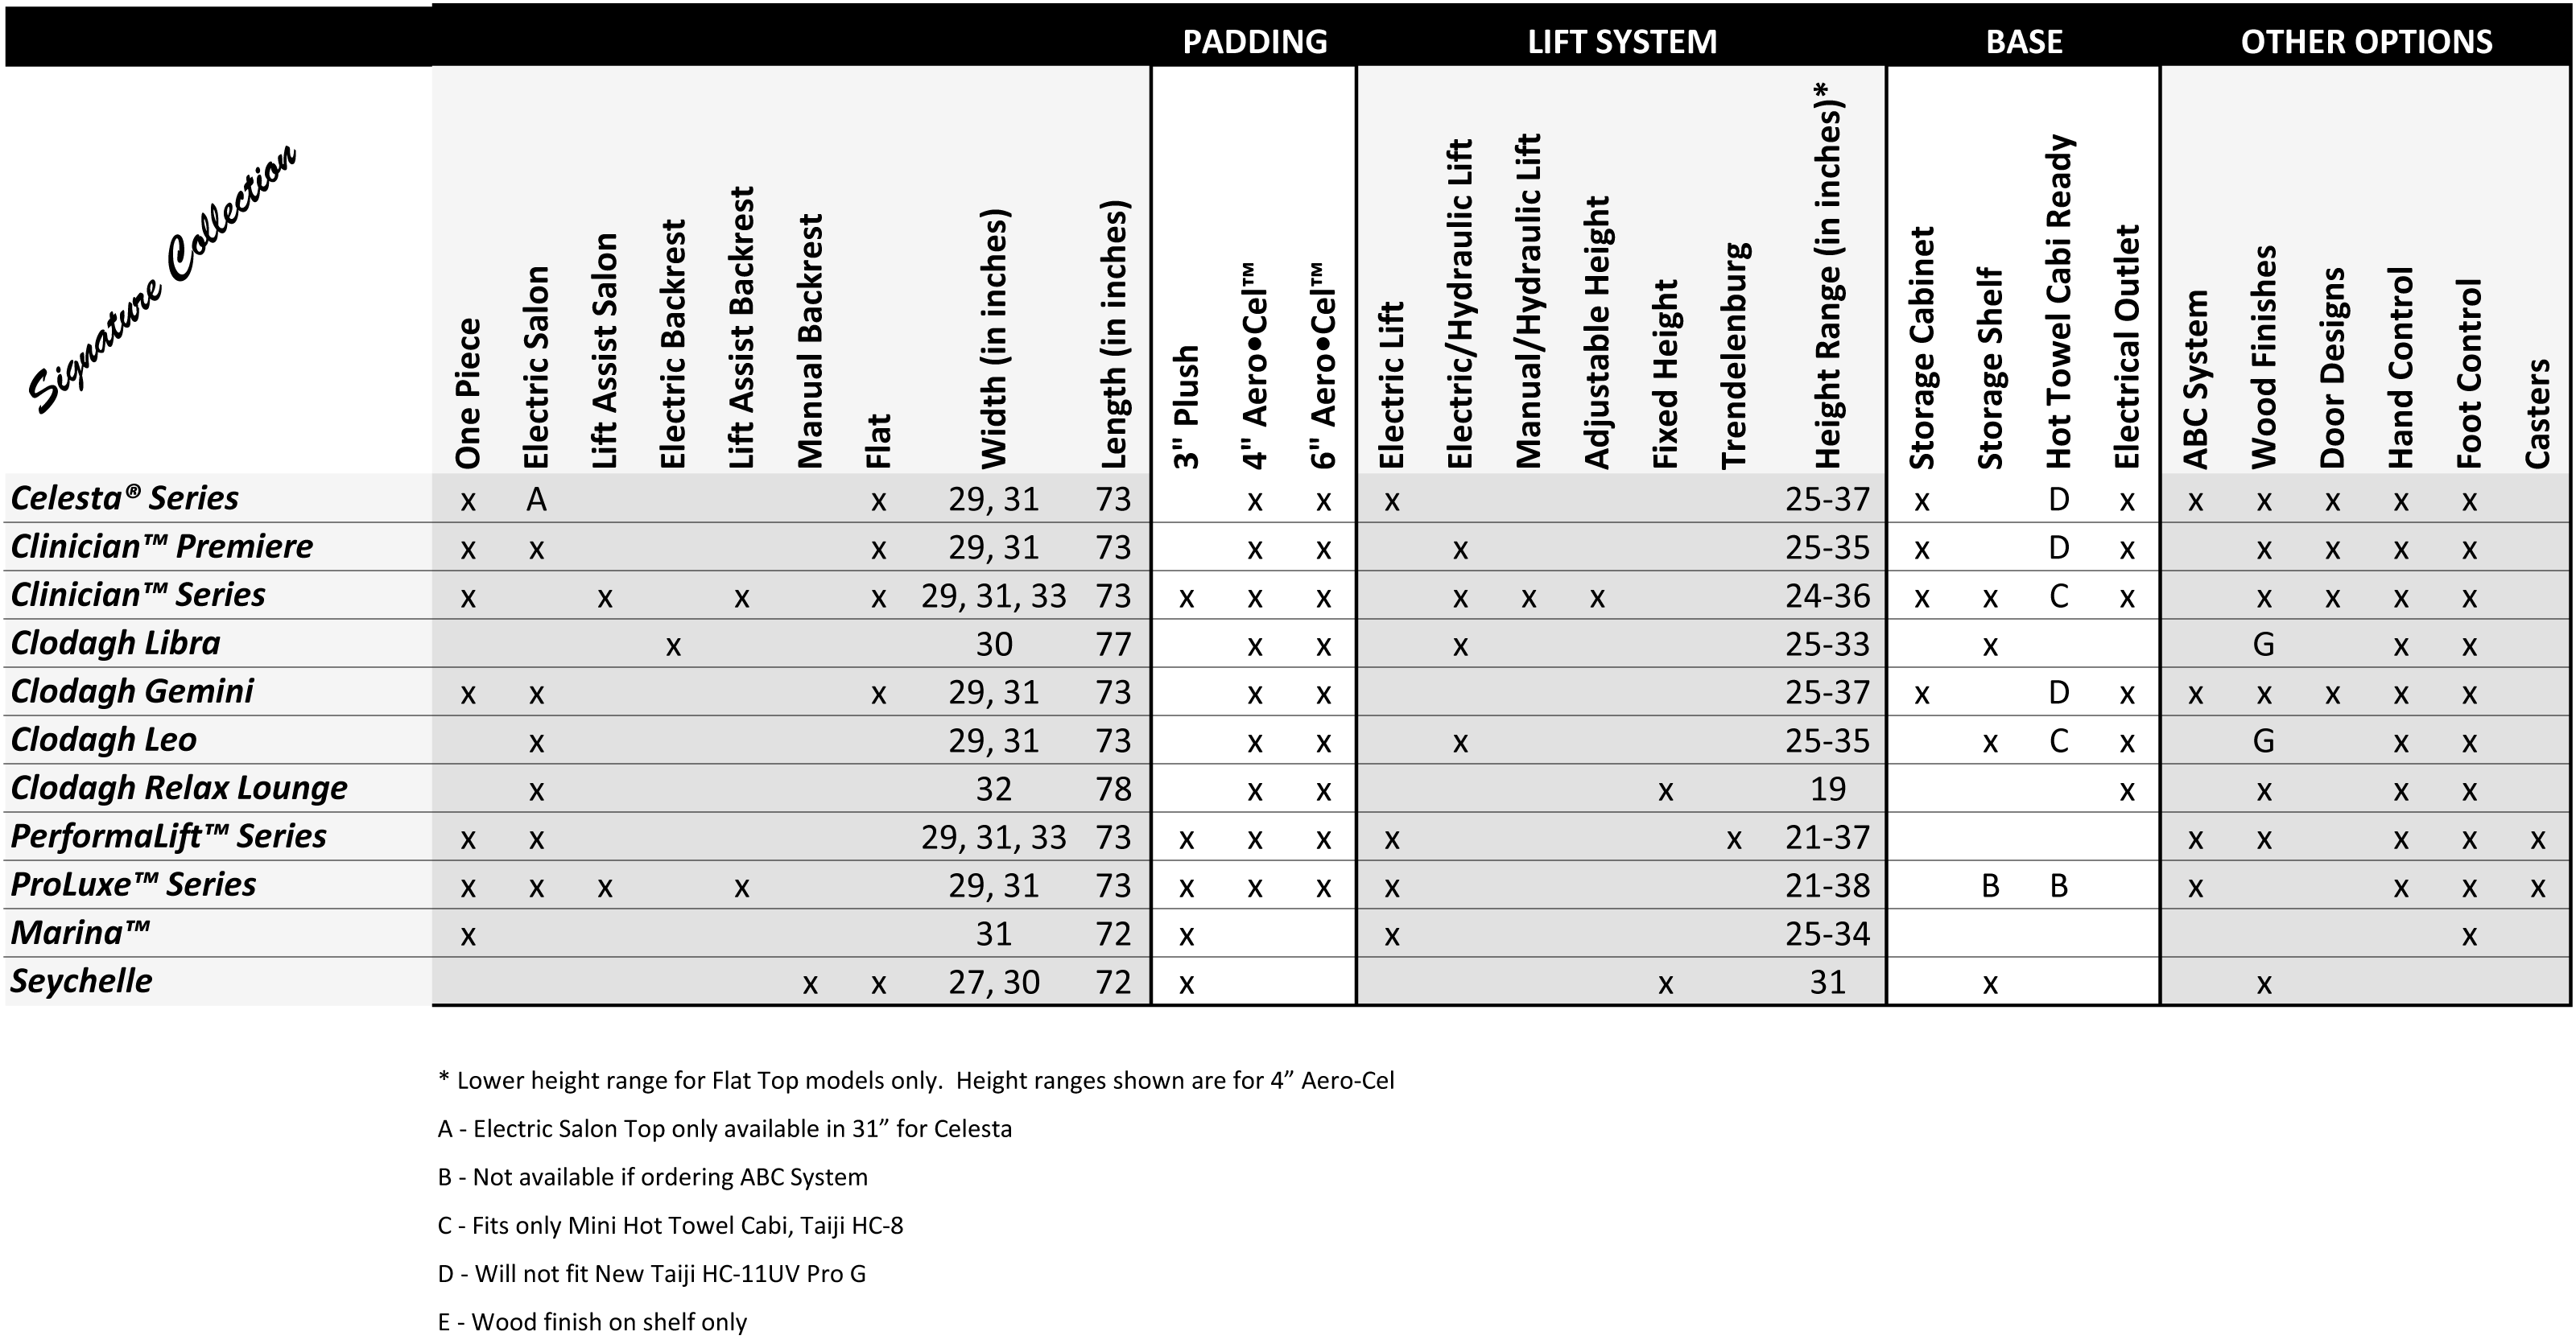 Oakworks Stationary Comparison Sheet